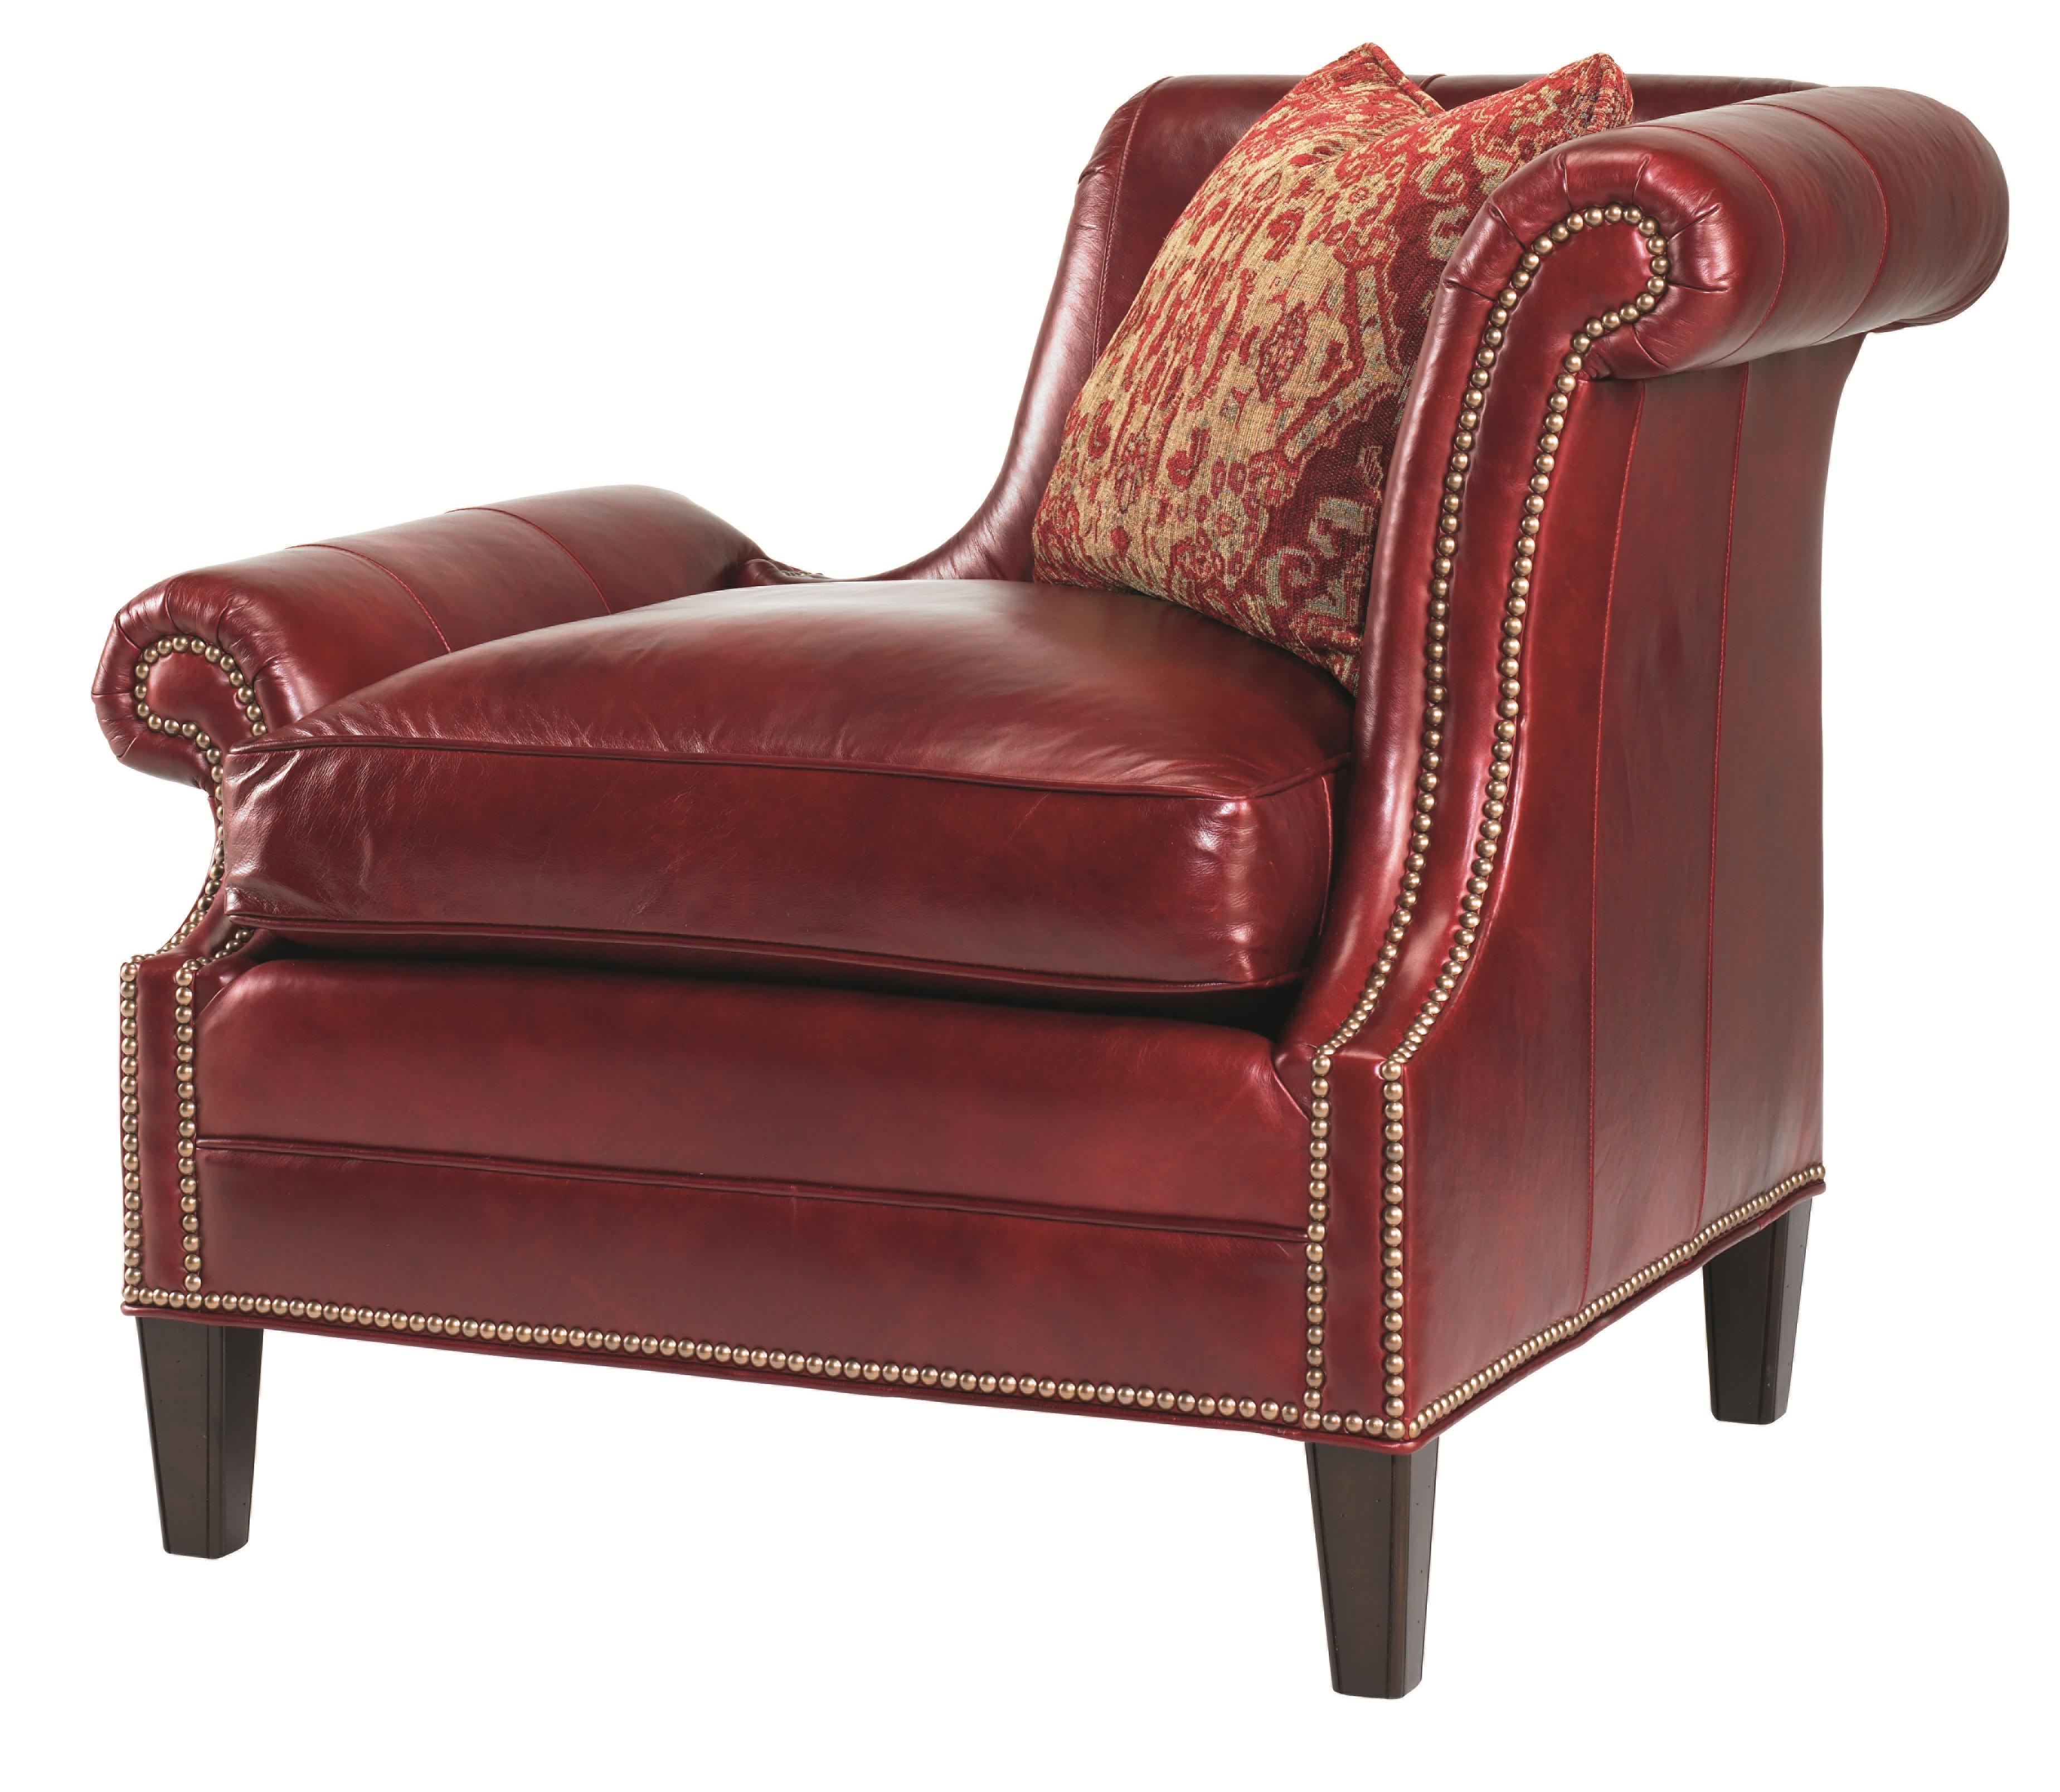 Braddock Raf Upholstered Chair